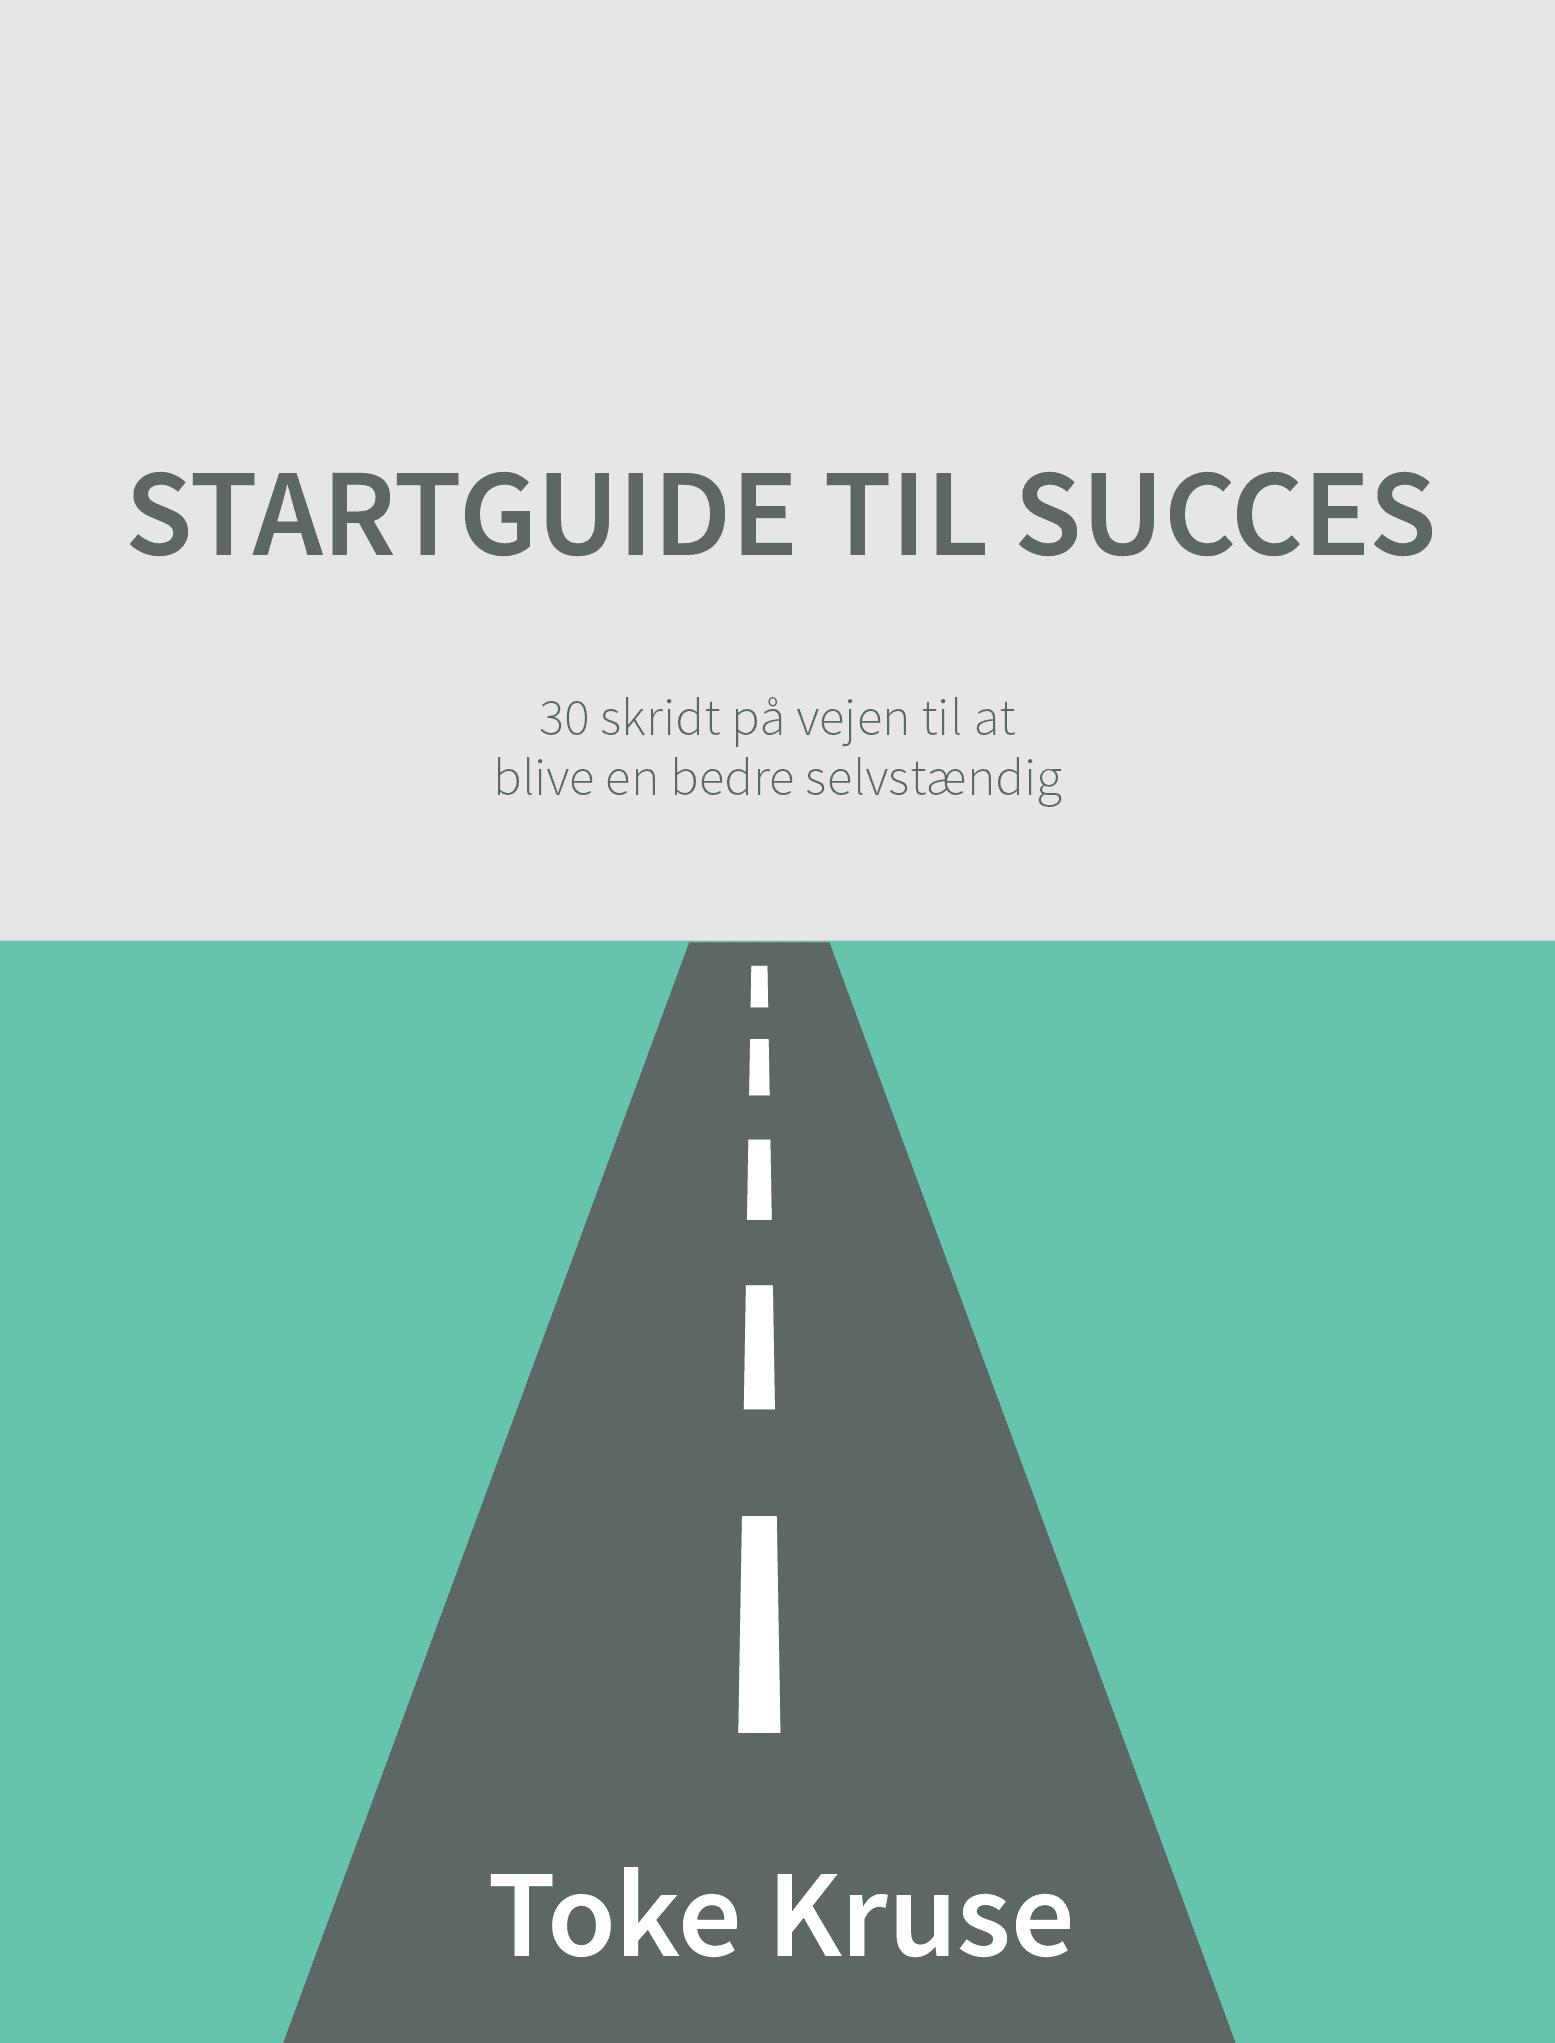 startuide-til-succes-cover-large